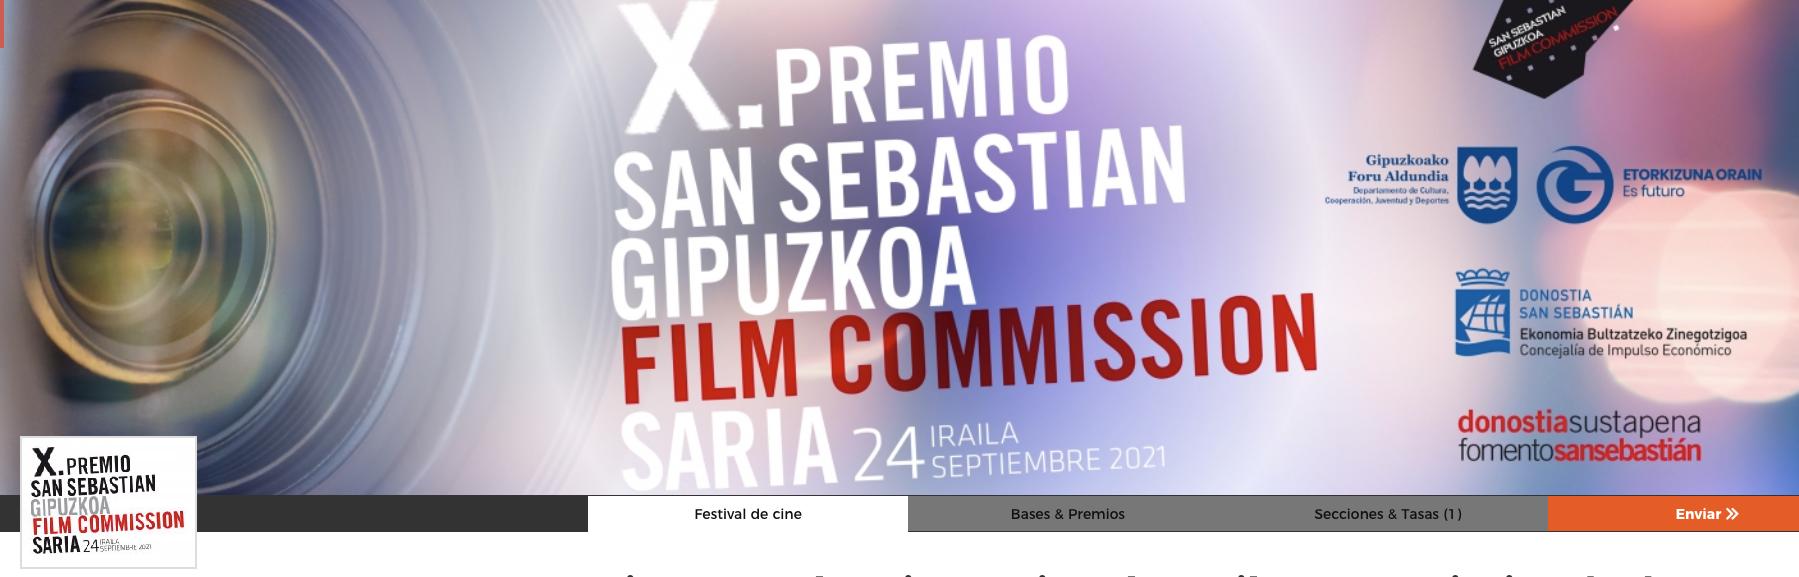 Mañana termina el plazo de participación para el X Premio San Sebastián-Guipuzkoa Film Commission